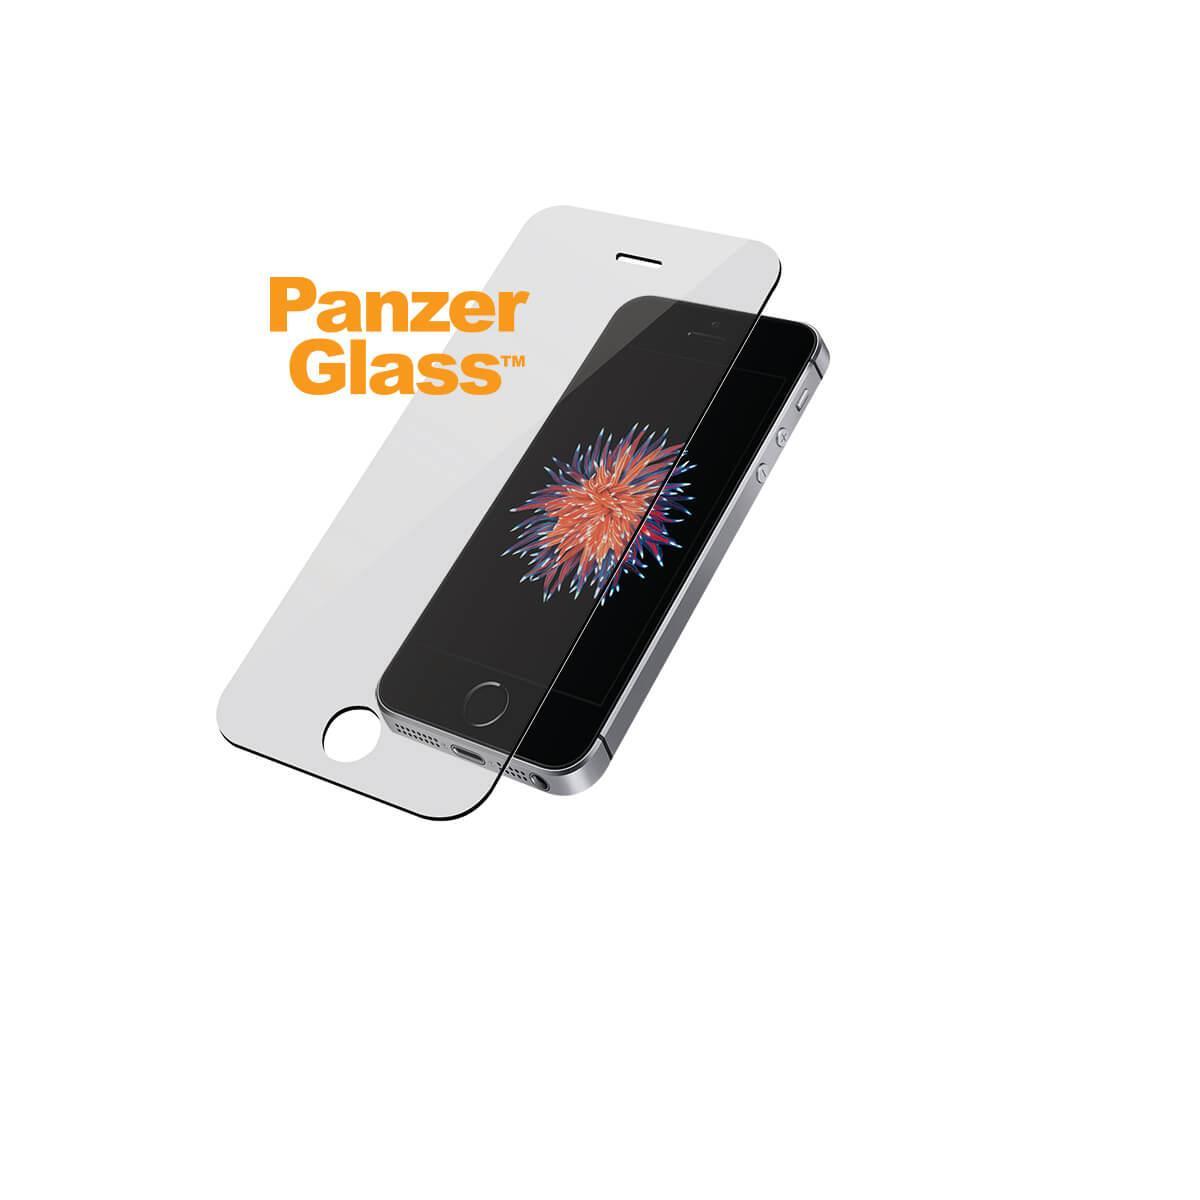 Ochranné sklo displeje PanzerGlass Edge to Edge Privacy pro Apple iPhone 5/5S/5SE, clear